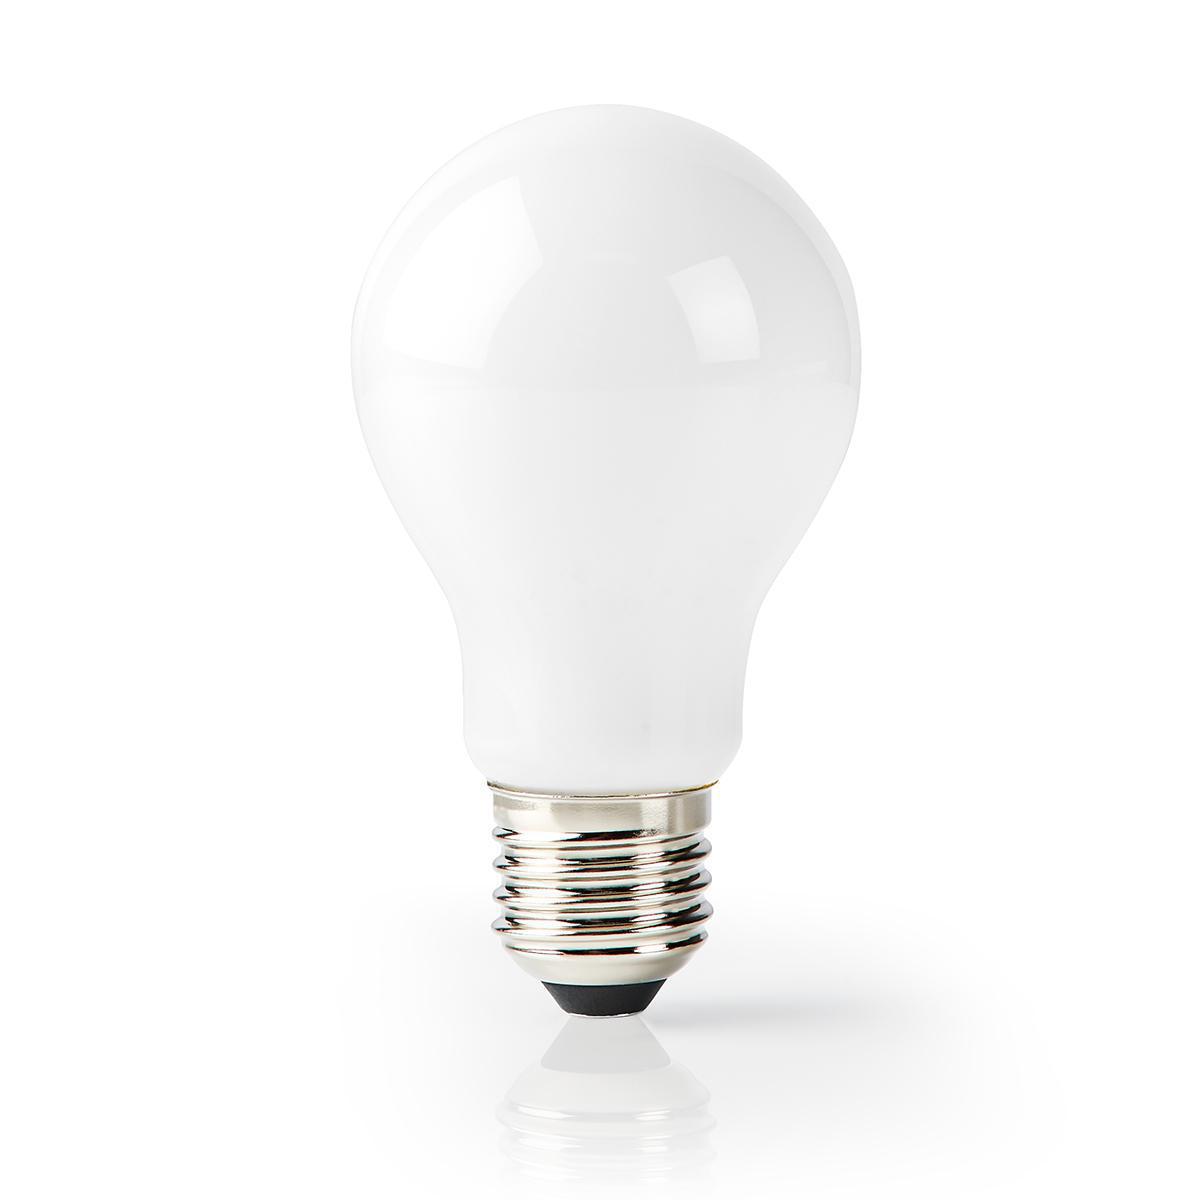 Slimme Led Lamp met wifi E27 fitting 2700K - warm wit - lamp uit